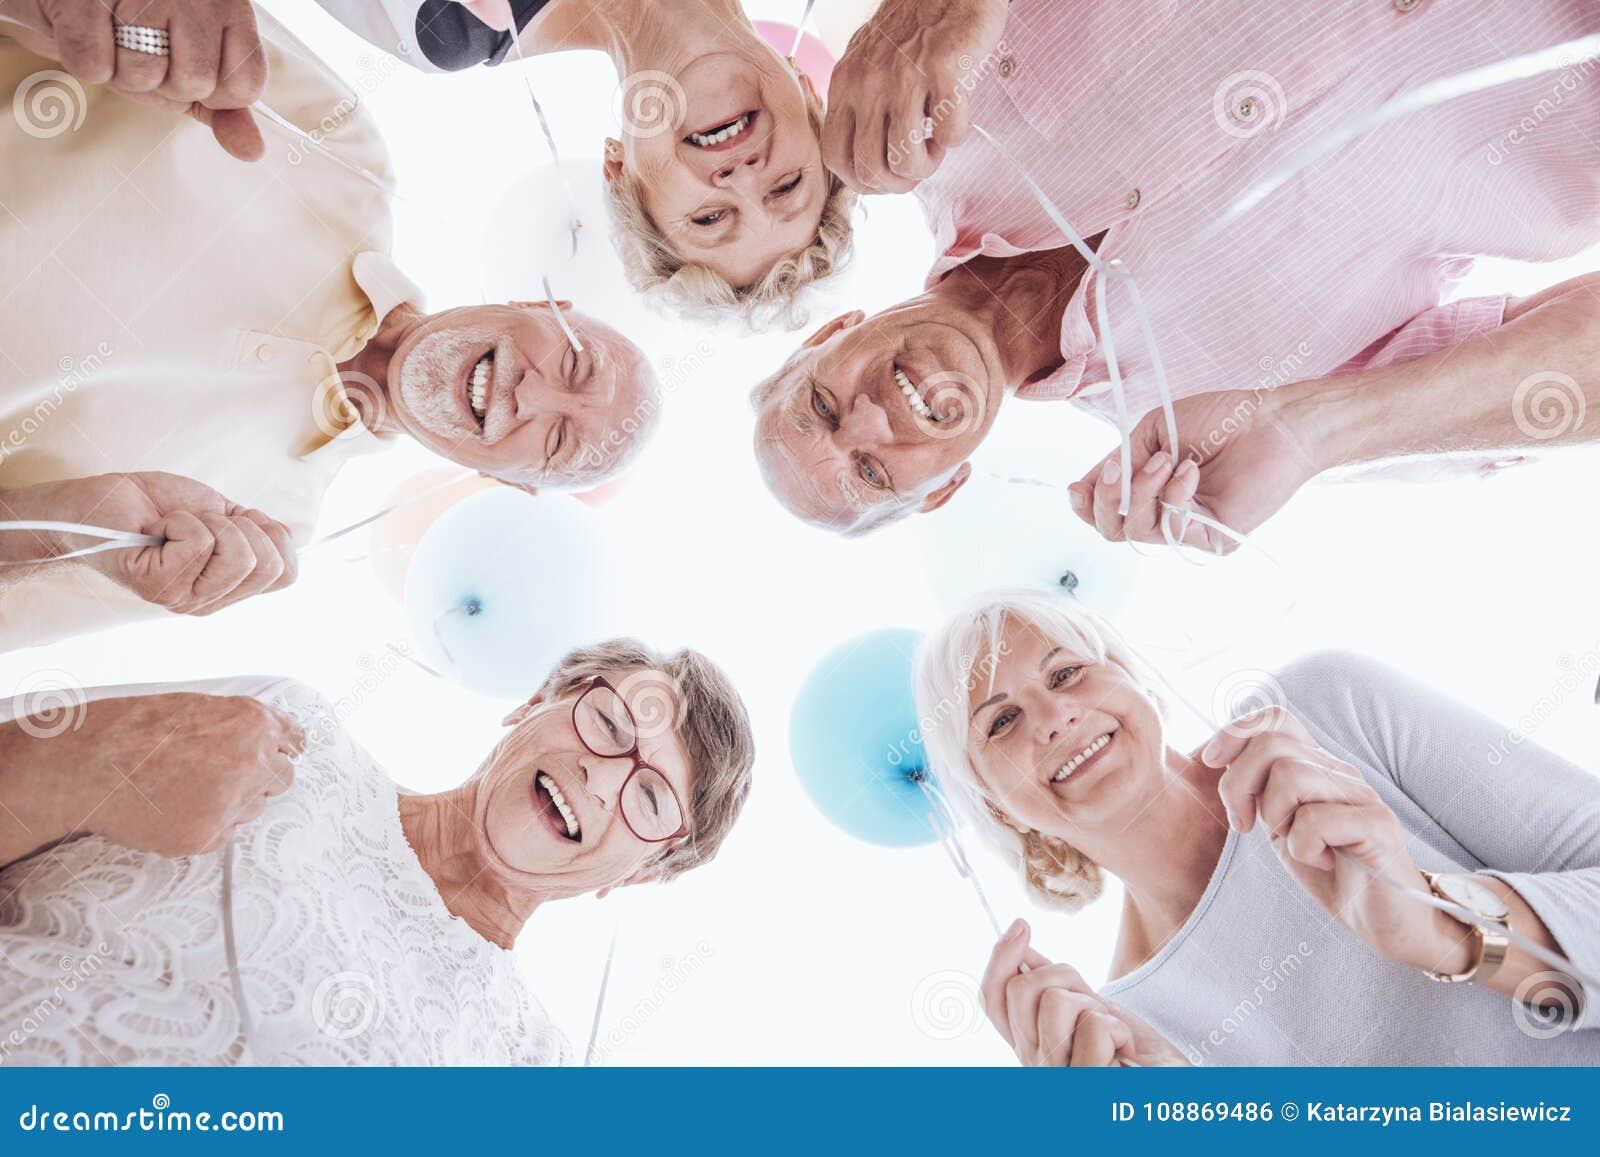 Seniors looking down